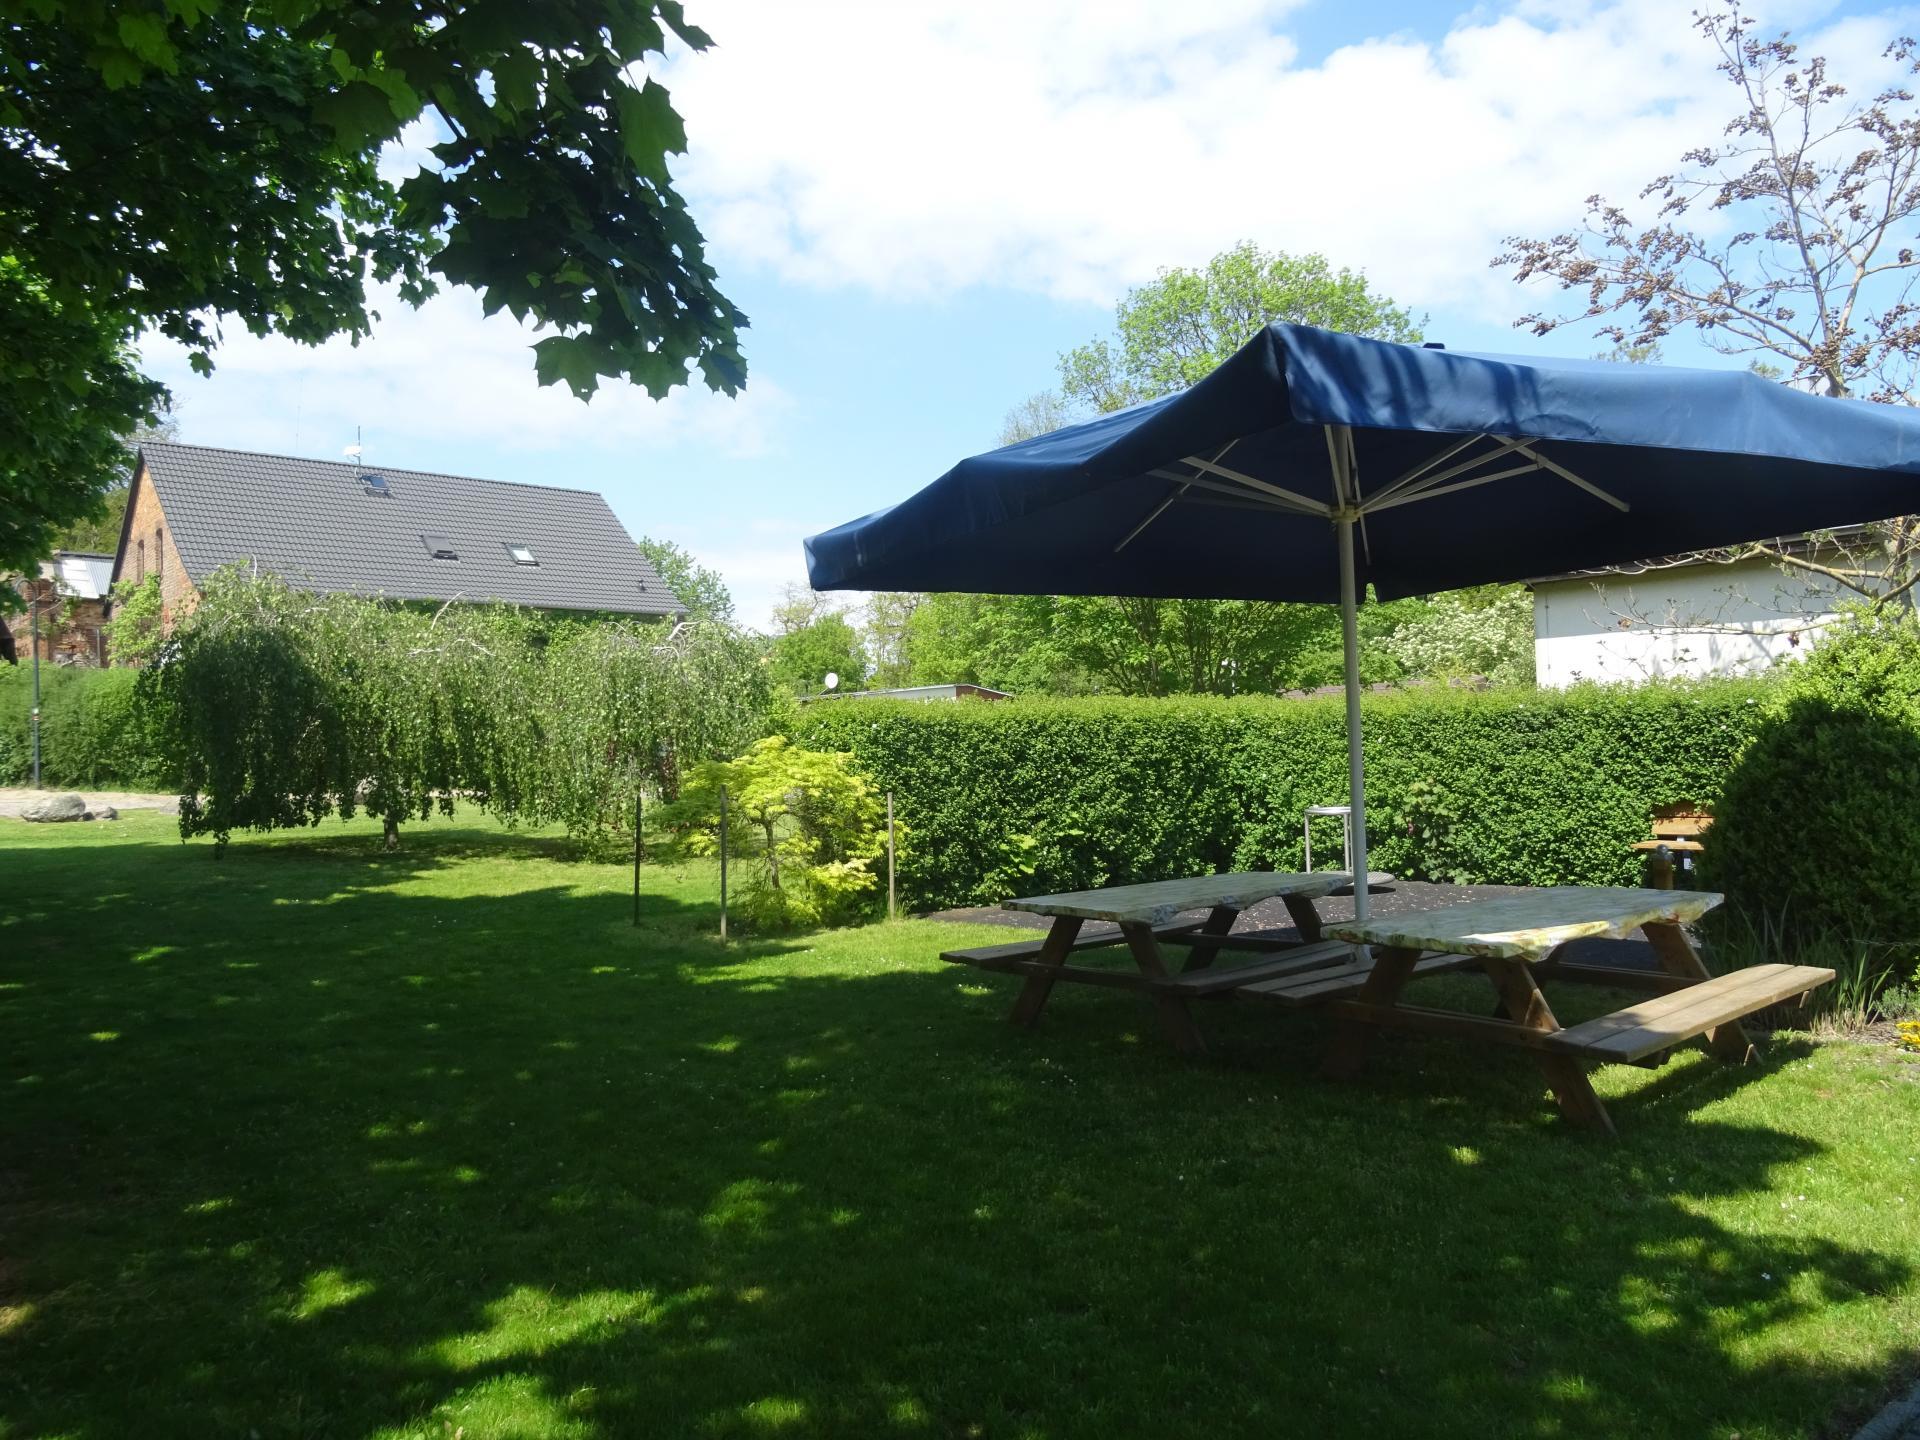 Terrasse im Innenhof   Foto: Info Punkt Lebus